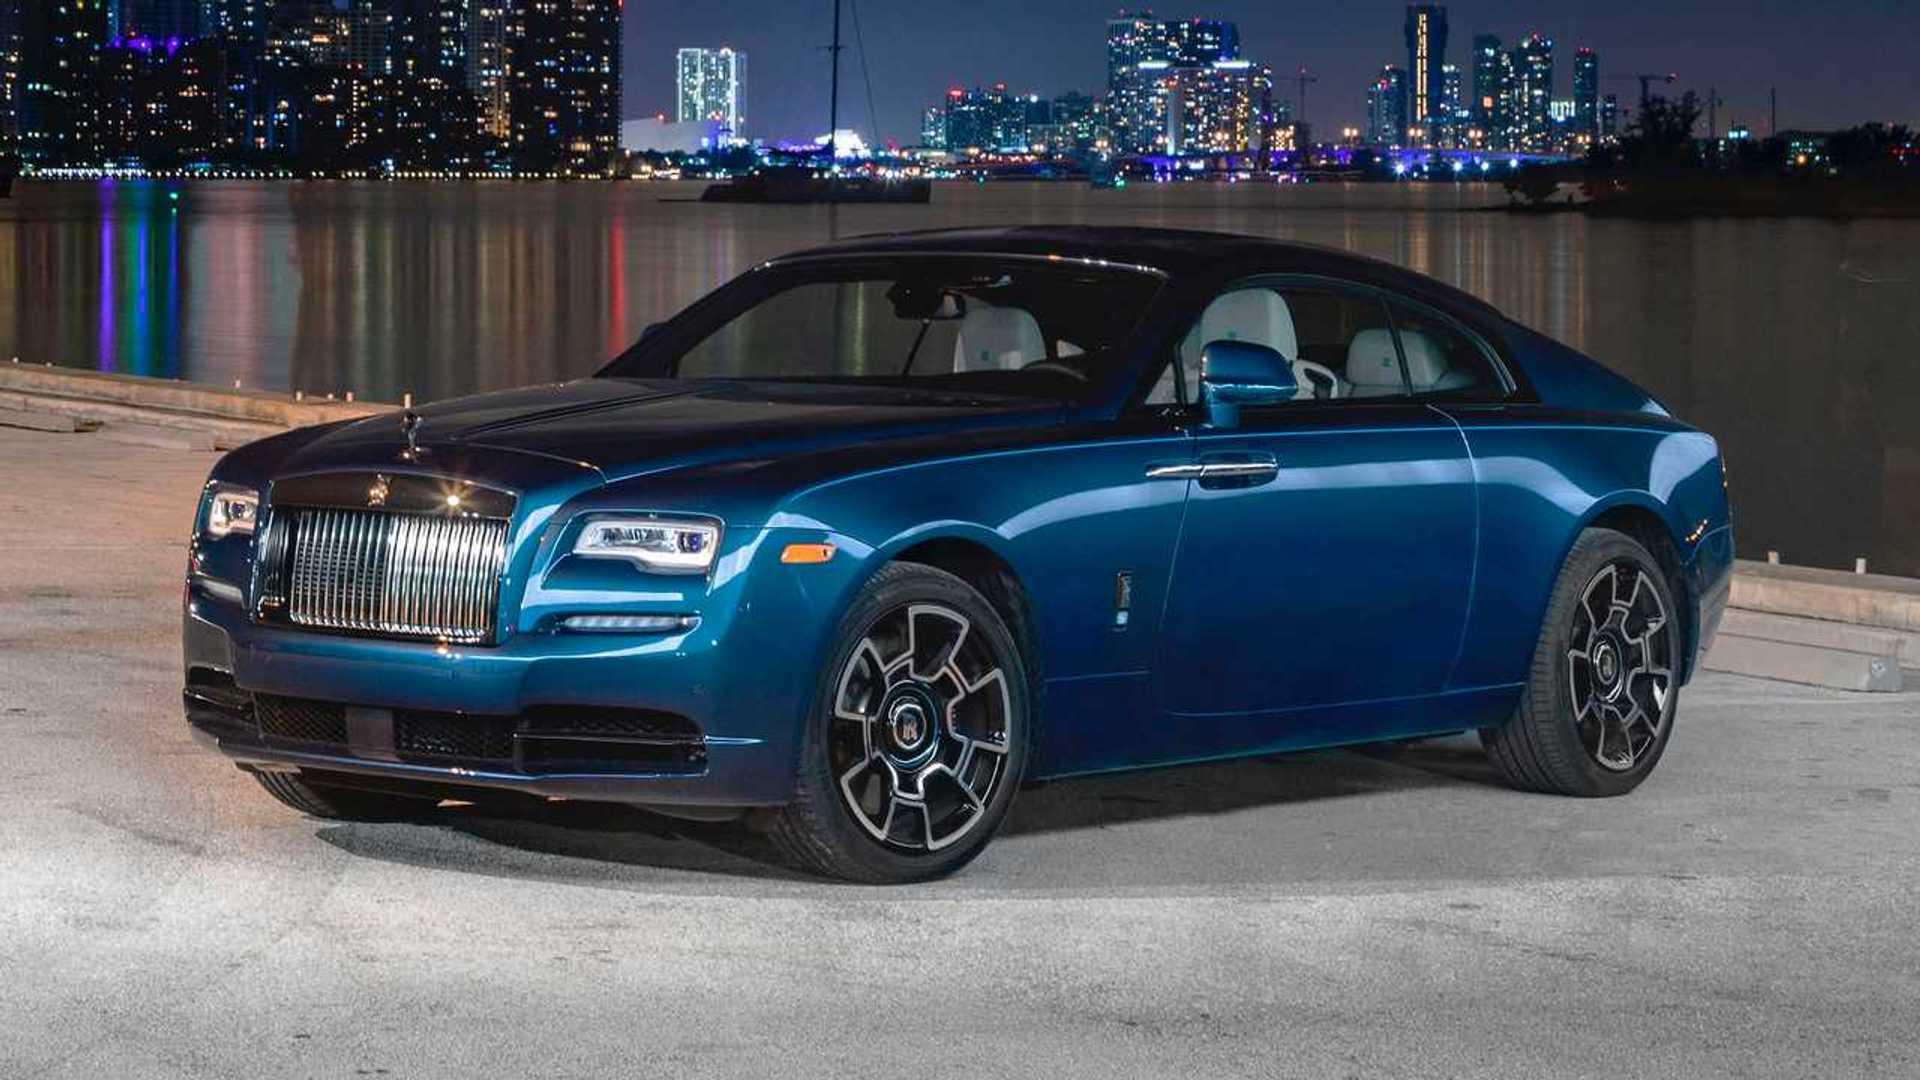 The Rolls Royce Wraith Black Badge Is Peak Miami